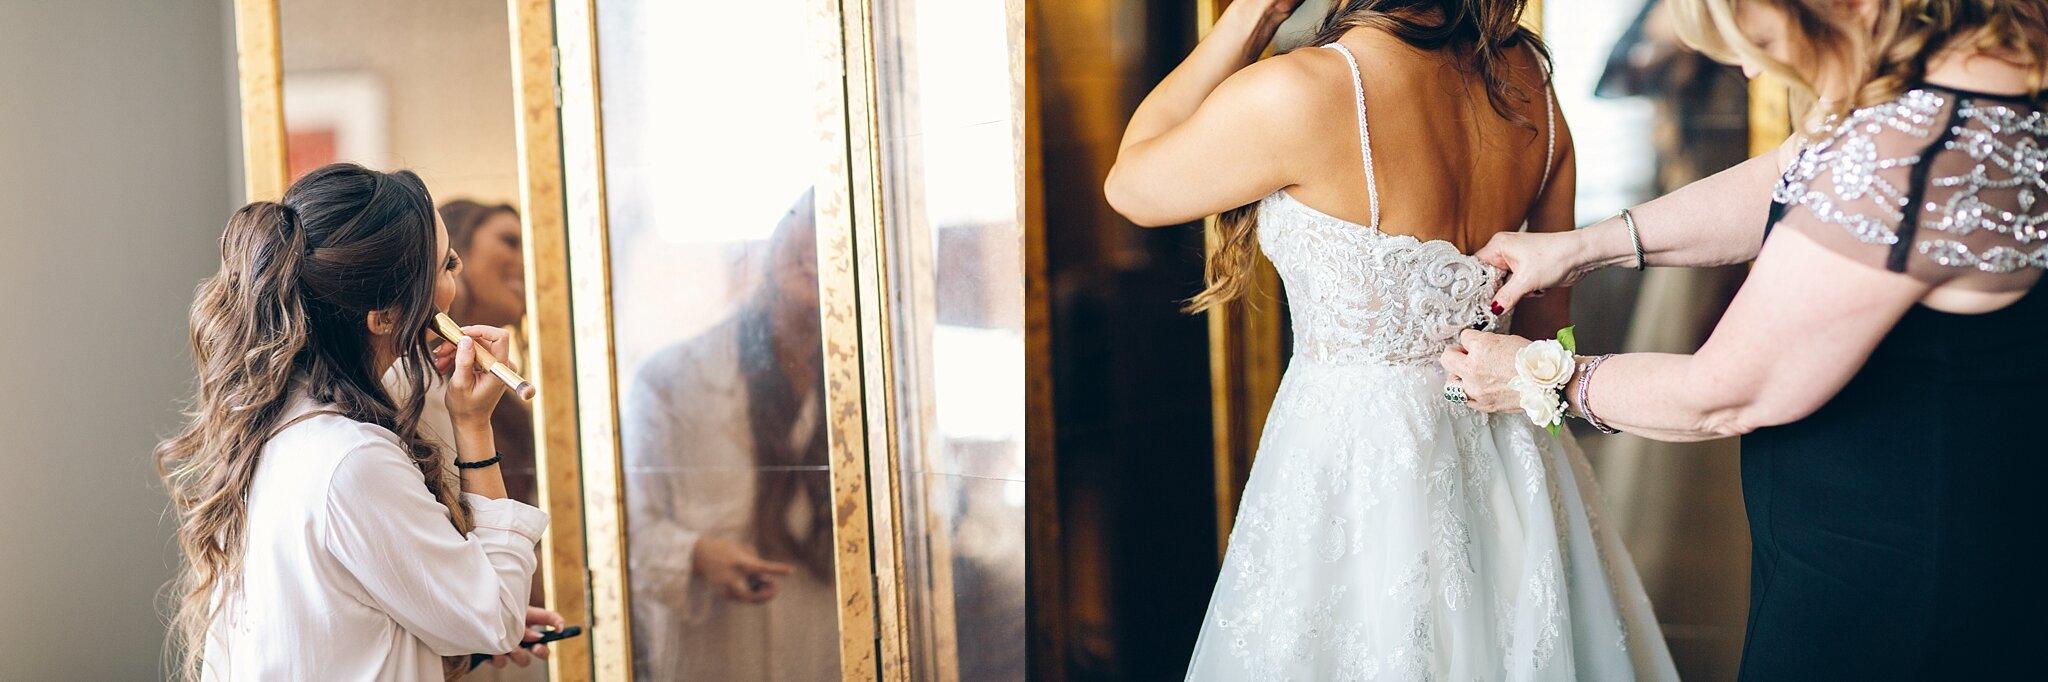 patrick-henry-ballroom-wedding-roanoke_0470.jpg